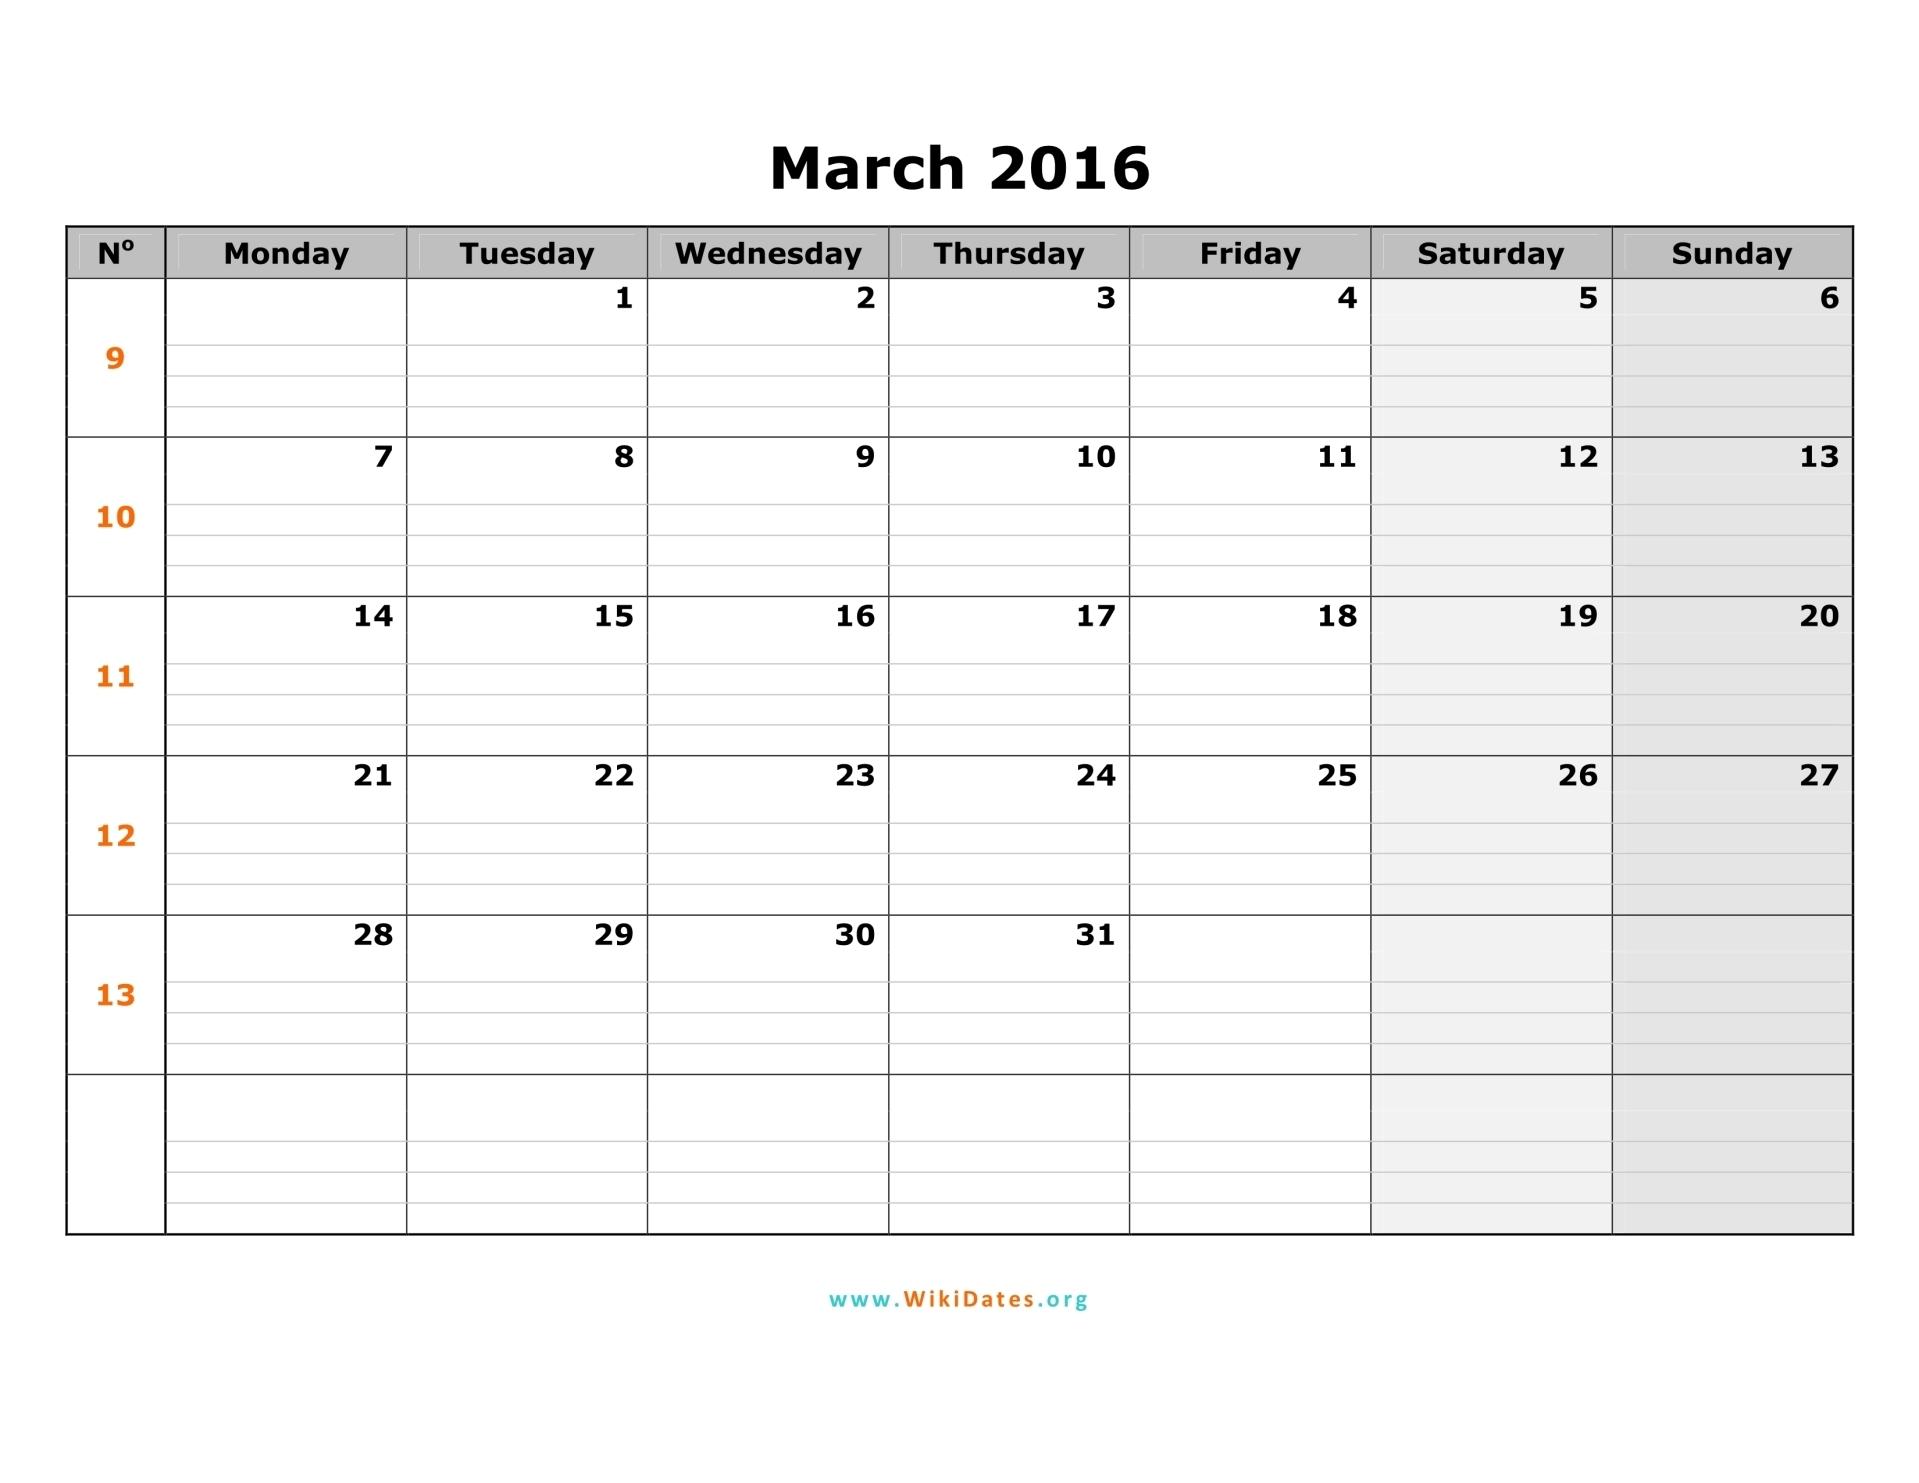 March 2016 Calendar | WikiDates.org